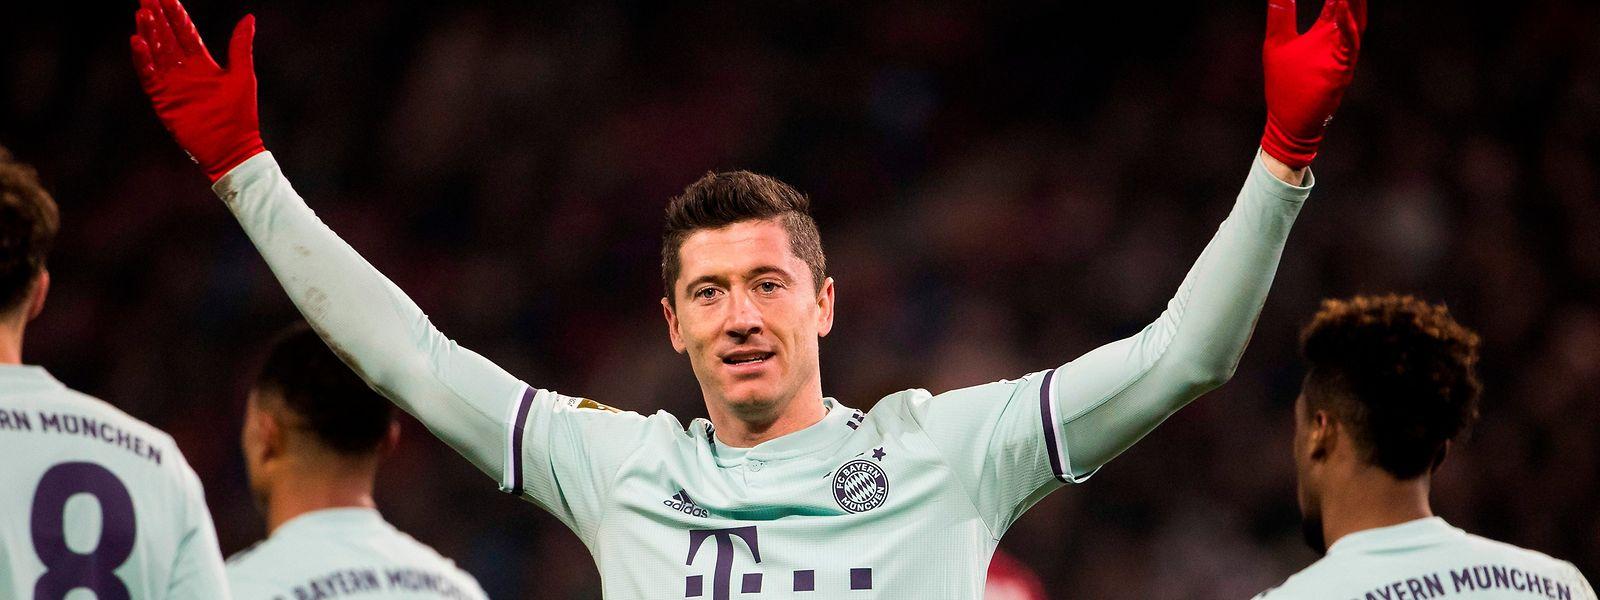 Robert Lewandowski fühlt sich beim FC Bayern wohl.